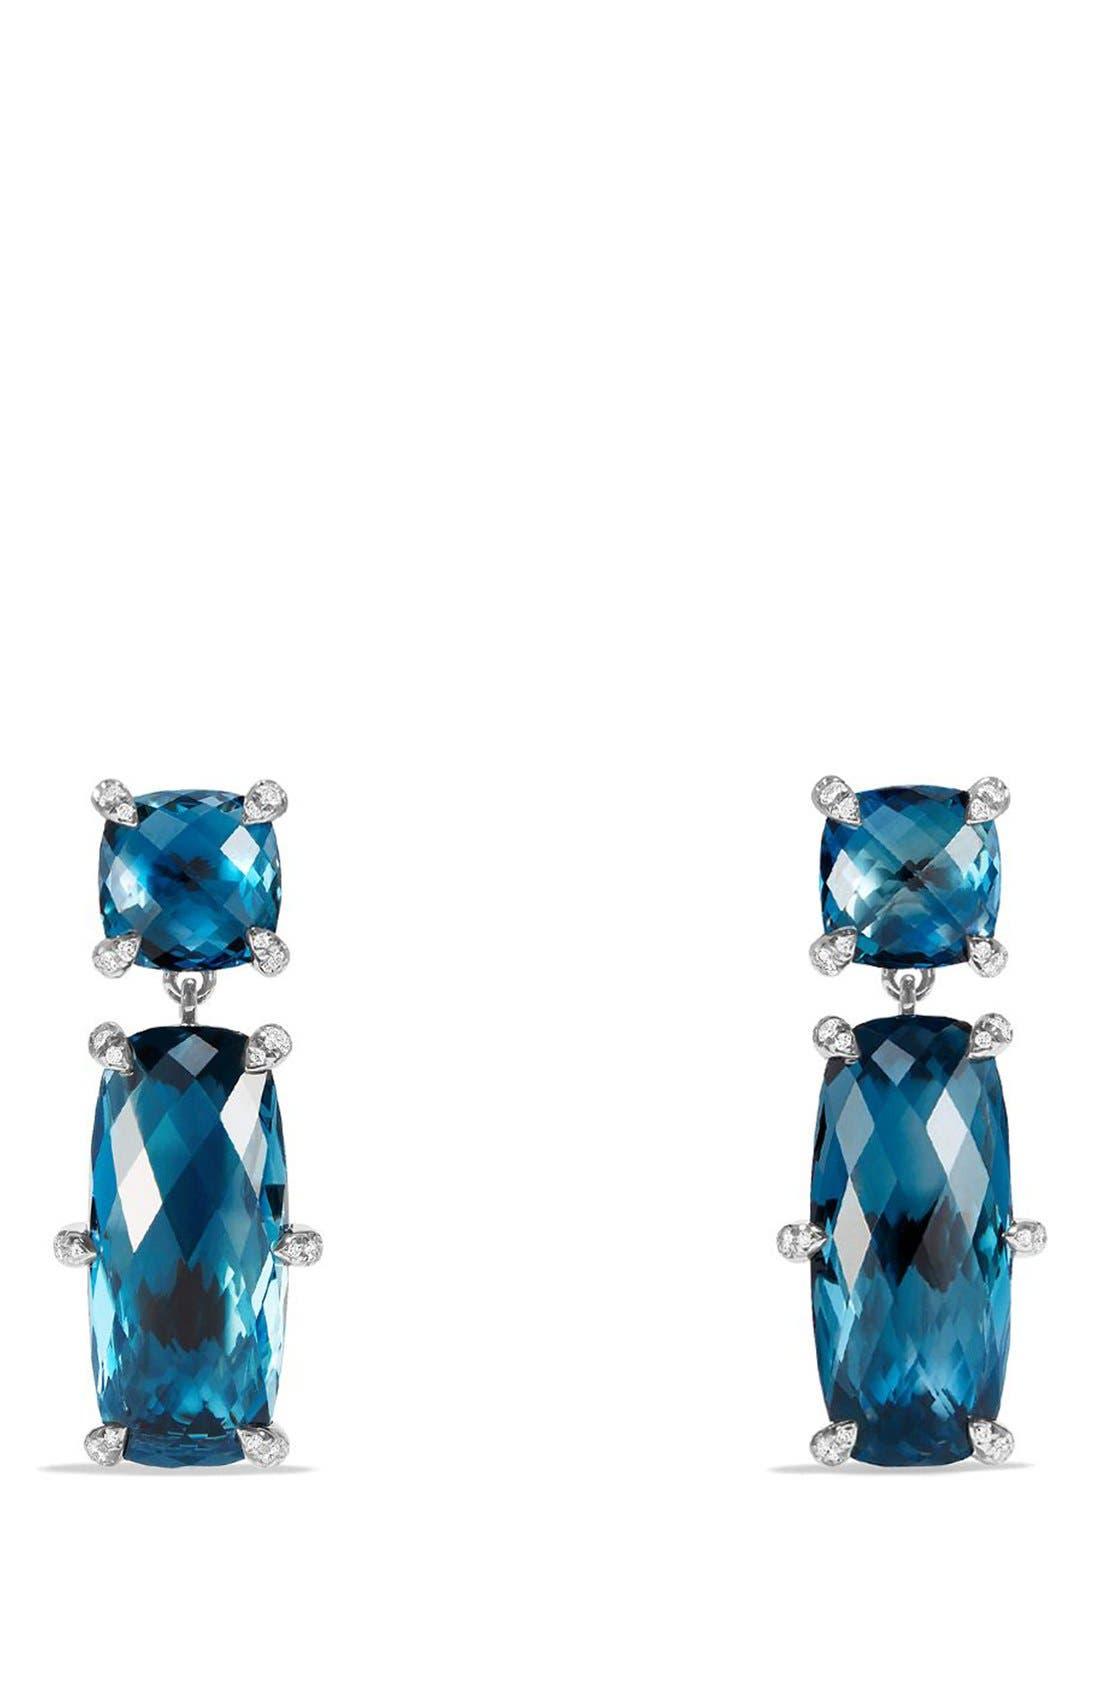 DAVID YURMAN 'Châtelaine' Double Drop Earrings, Main, color, SILVER/ HAMPTON BLUE TOPAZ